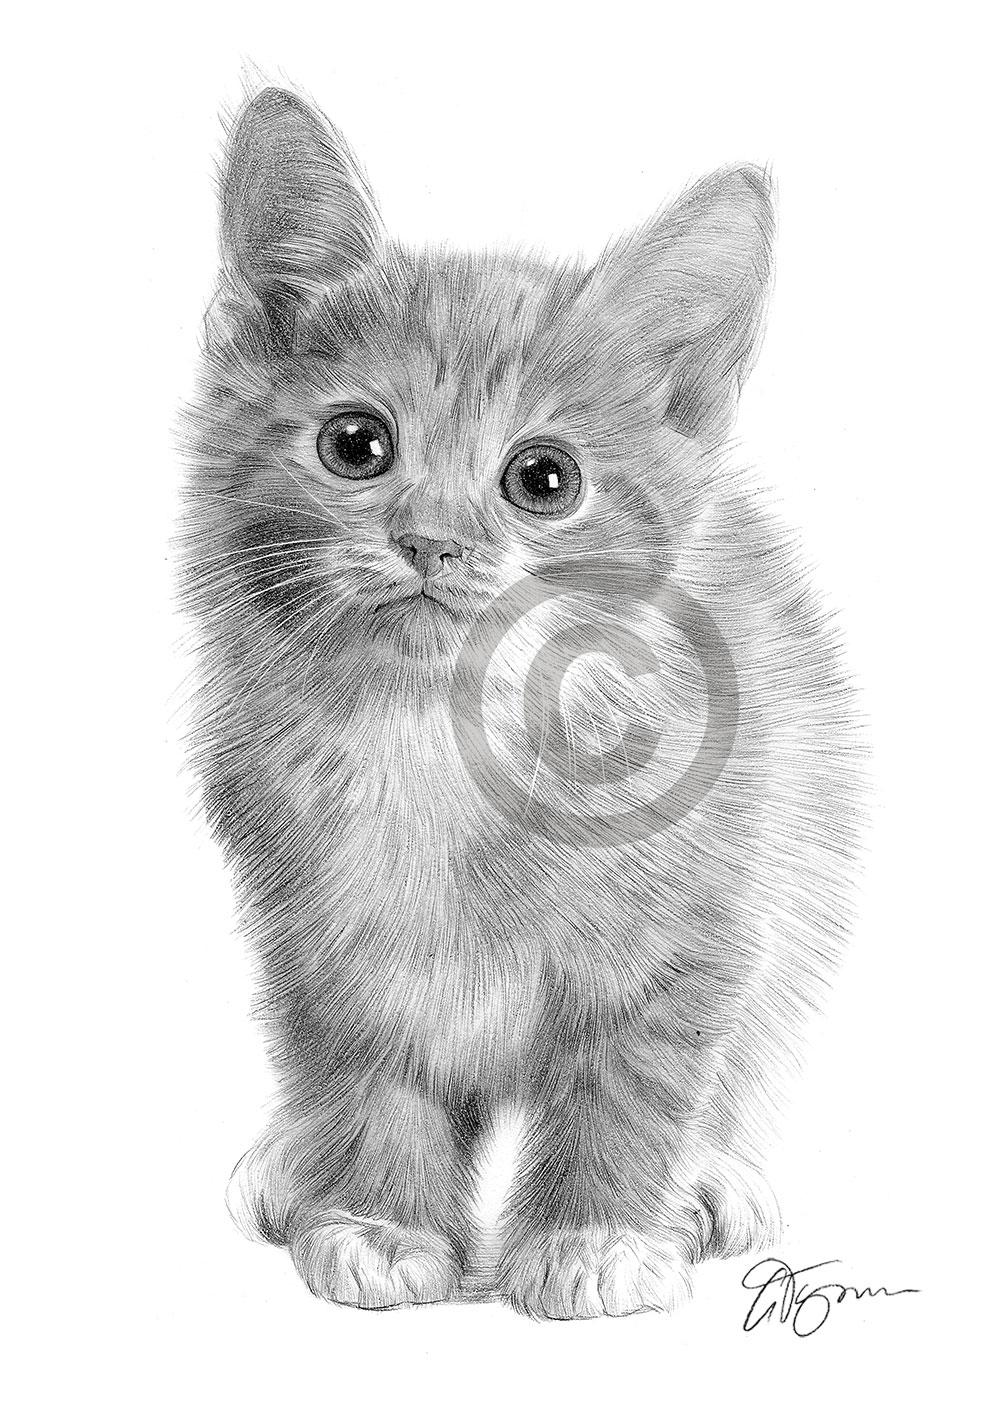 Details about cat kitten pencil drawing artwork a4 size by uk artist pet portrait